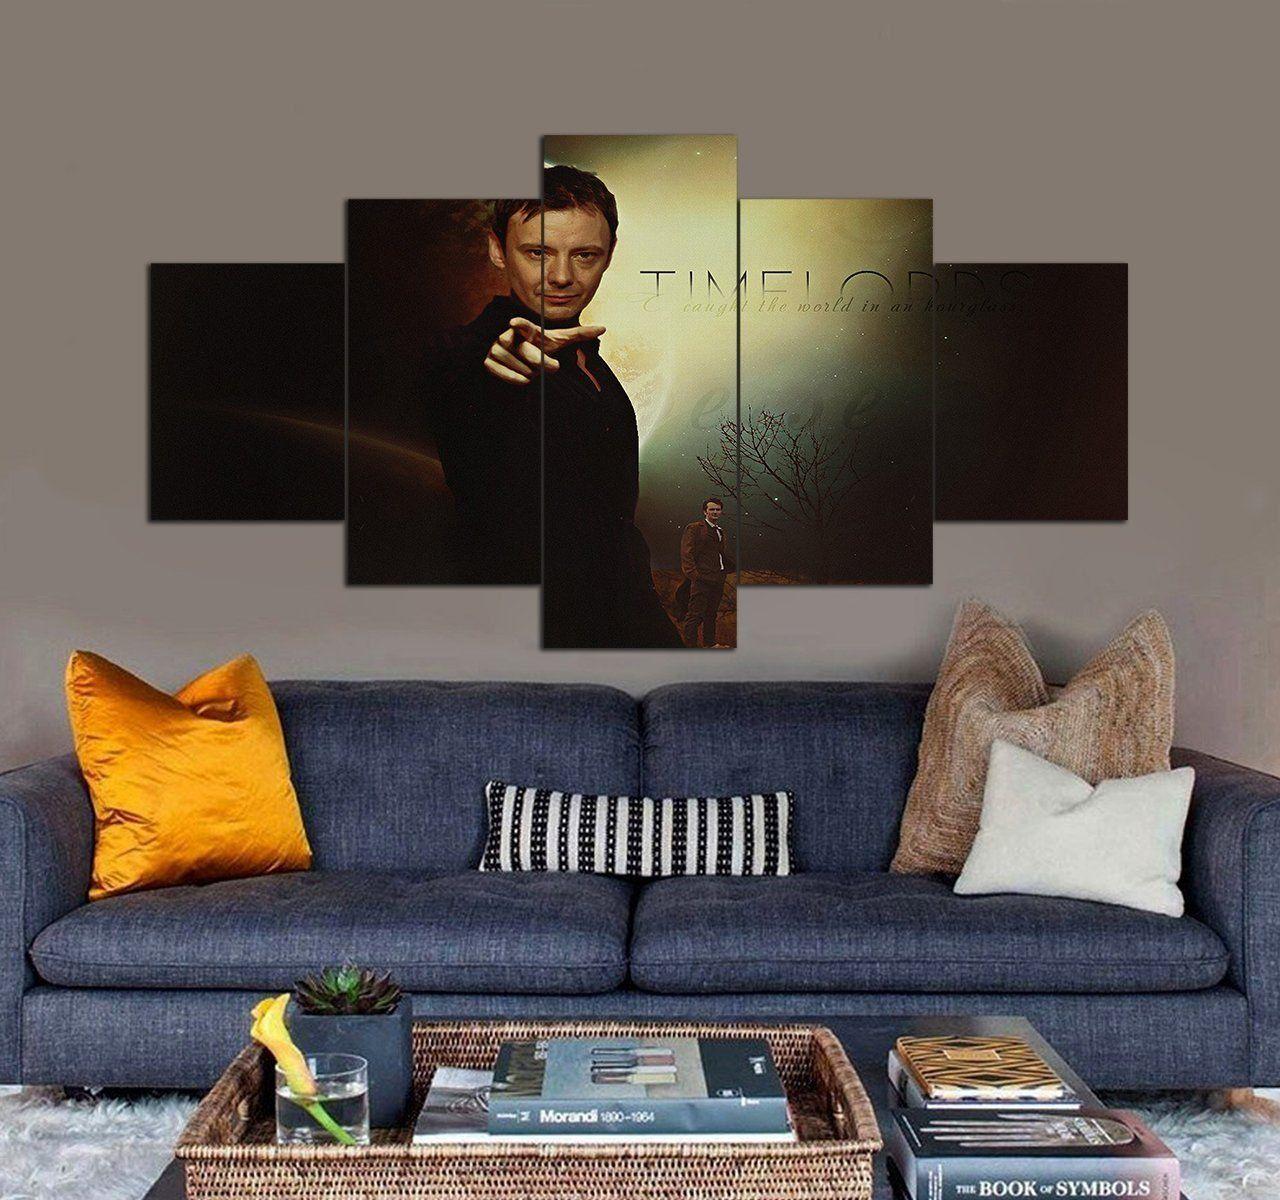 Doctor Who Canvas Art Prints Set Tv Shows 5 Piece Canvas Wall Art In 2020 Canvas Art Wall Decor Canvas Wall Art Set 5 Piece Canvas Art